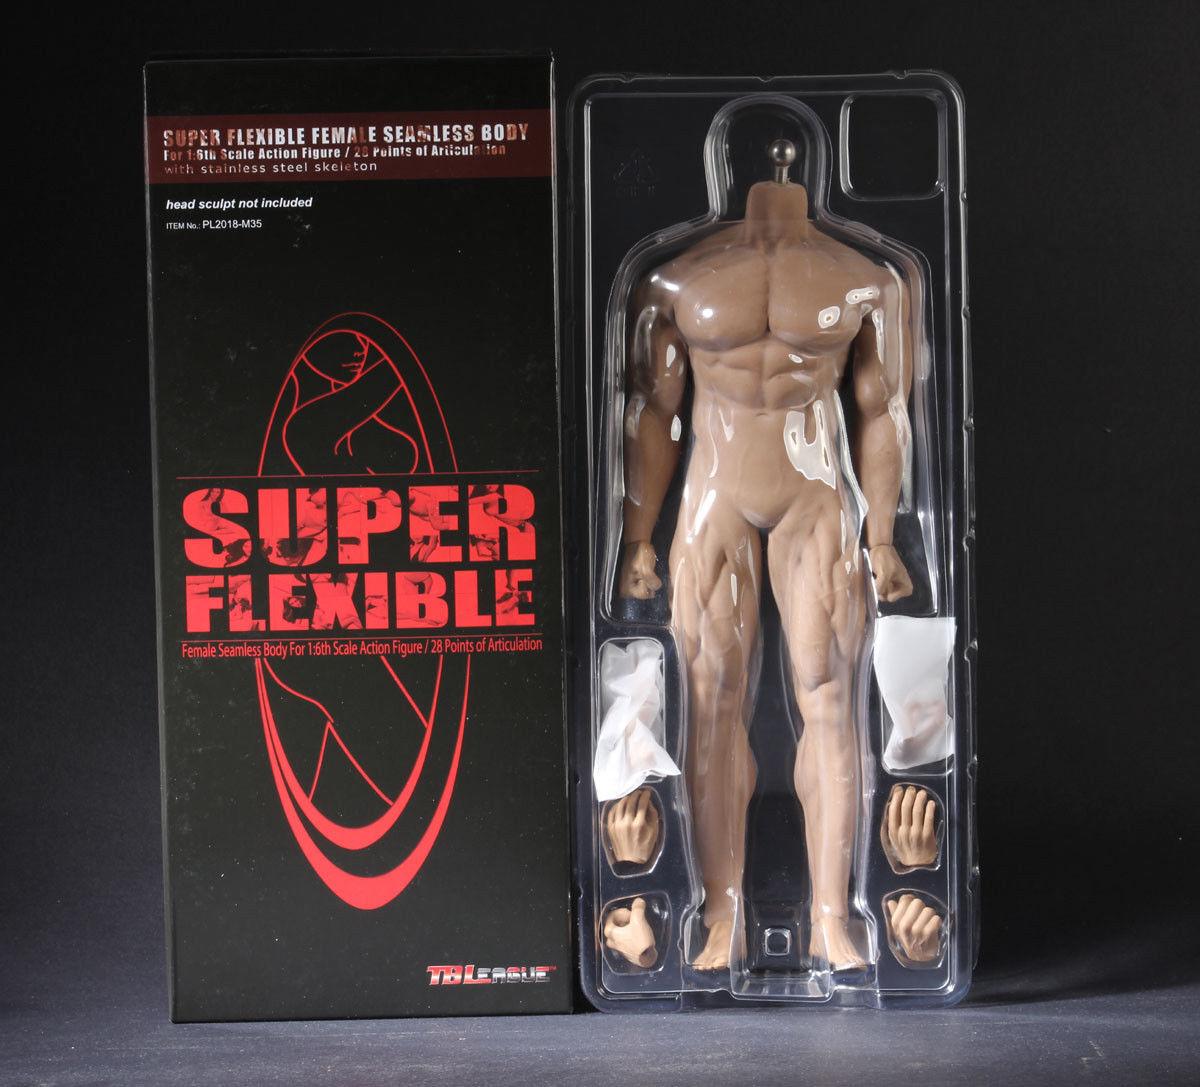 Nuovo Phicen M35 Super-Flexible Male Seamless Muscular Body w/ Steel Skeleton 1/6